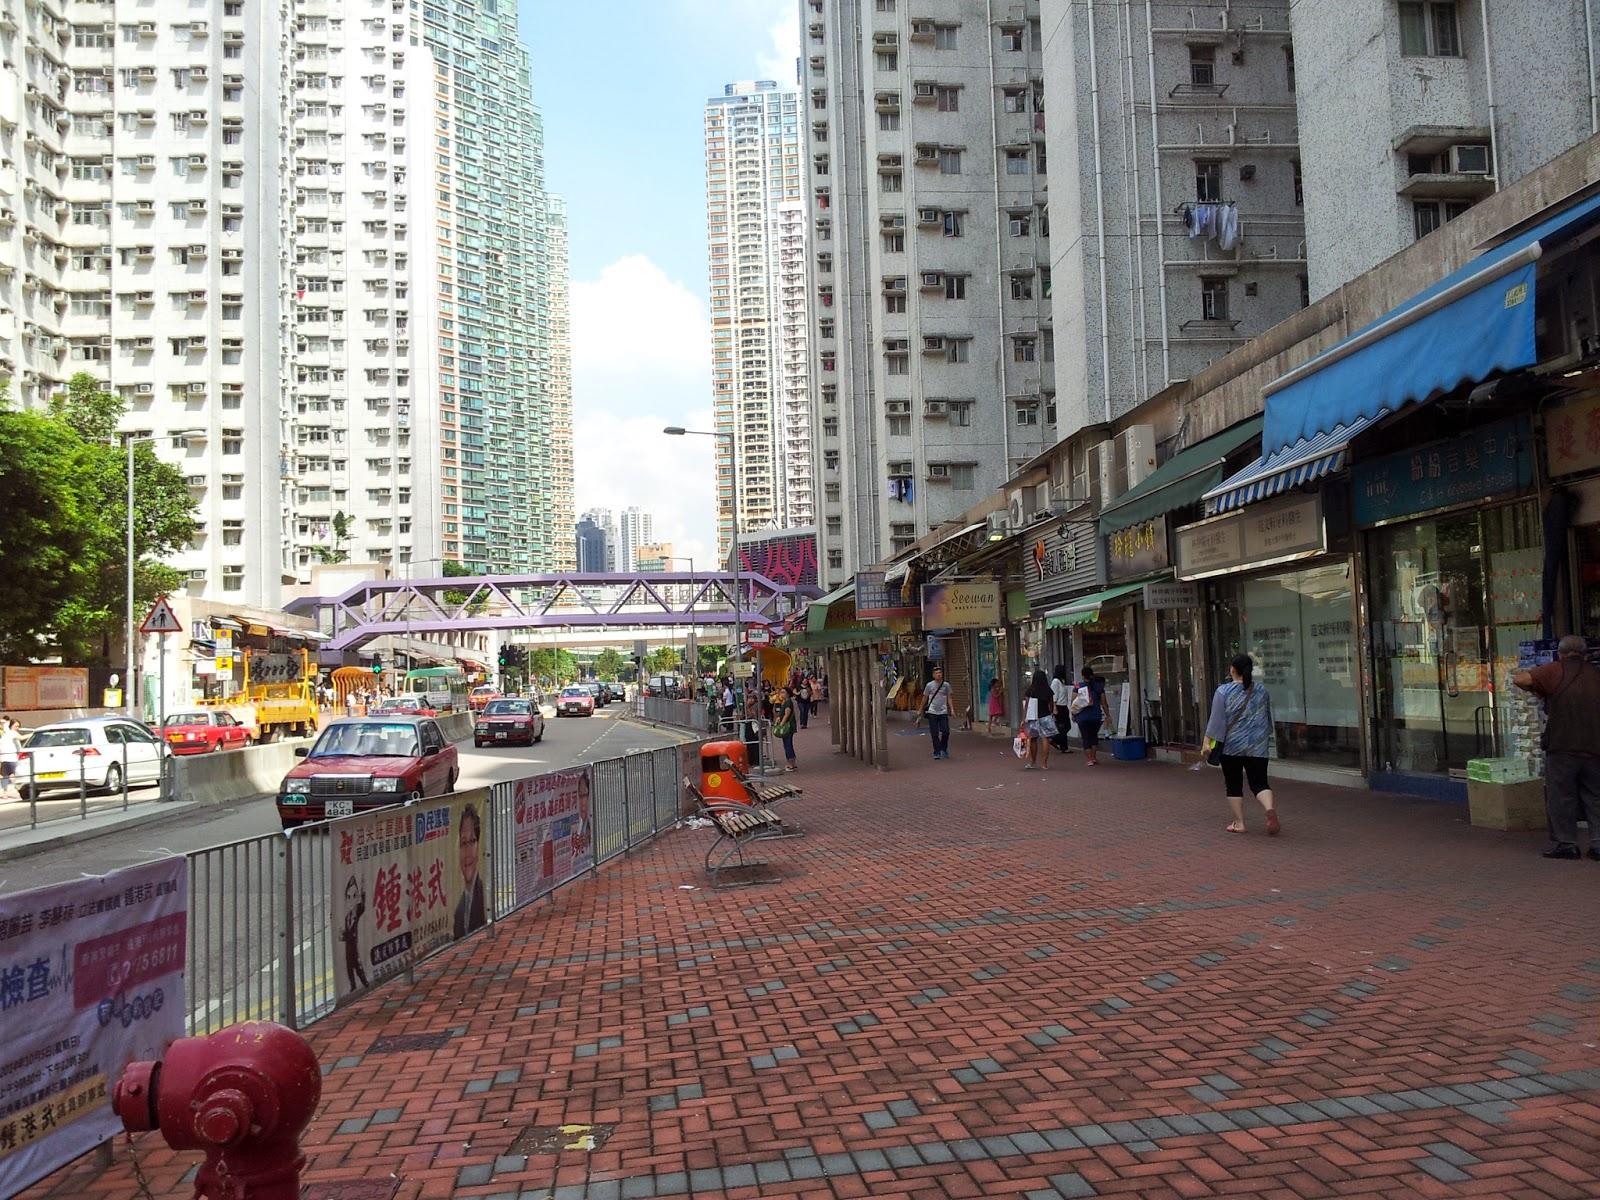 Grassroots O2: [領匯商場] 海富商場 @2014-09-27